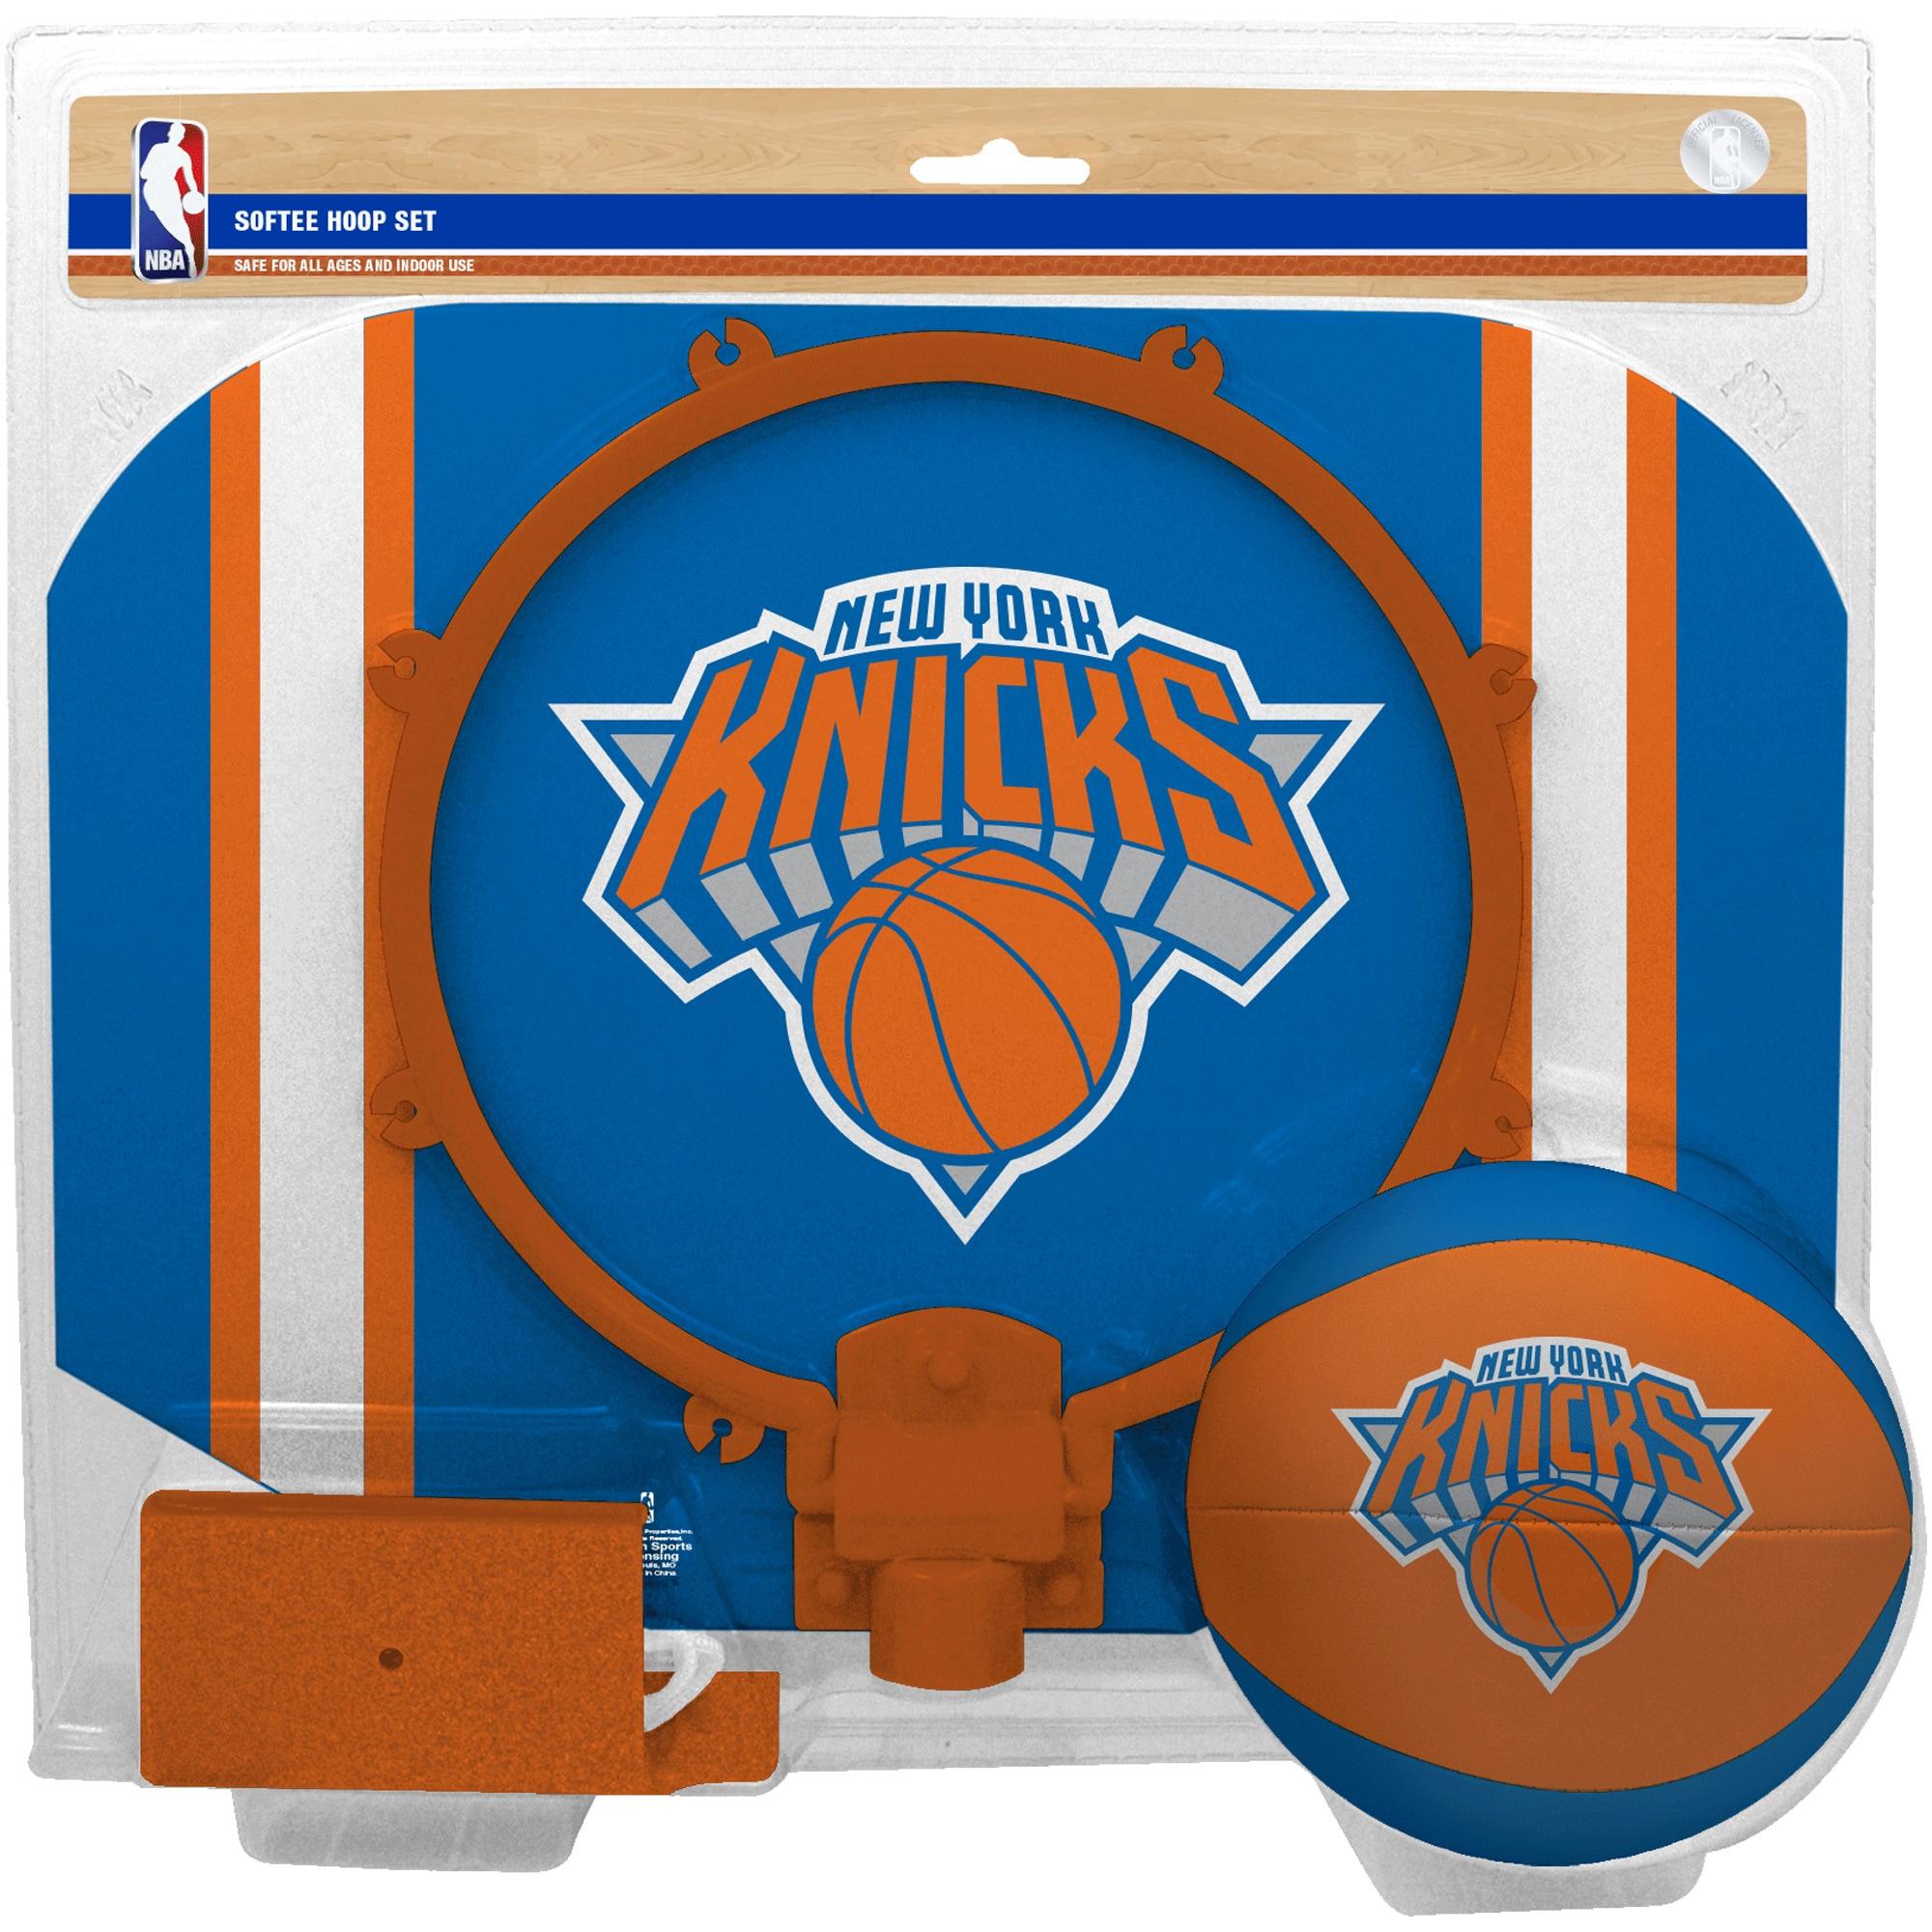 New York Knicks Rawlings Softee Hoop & Ball Set